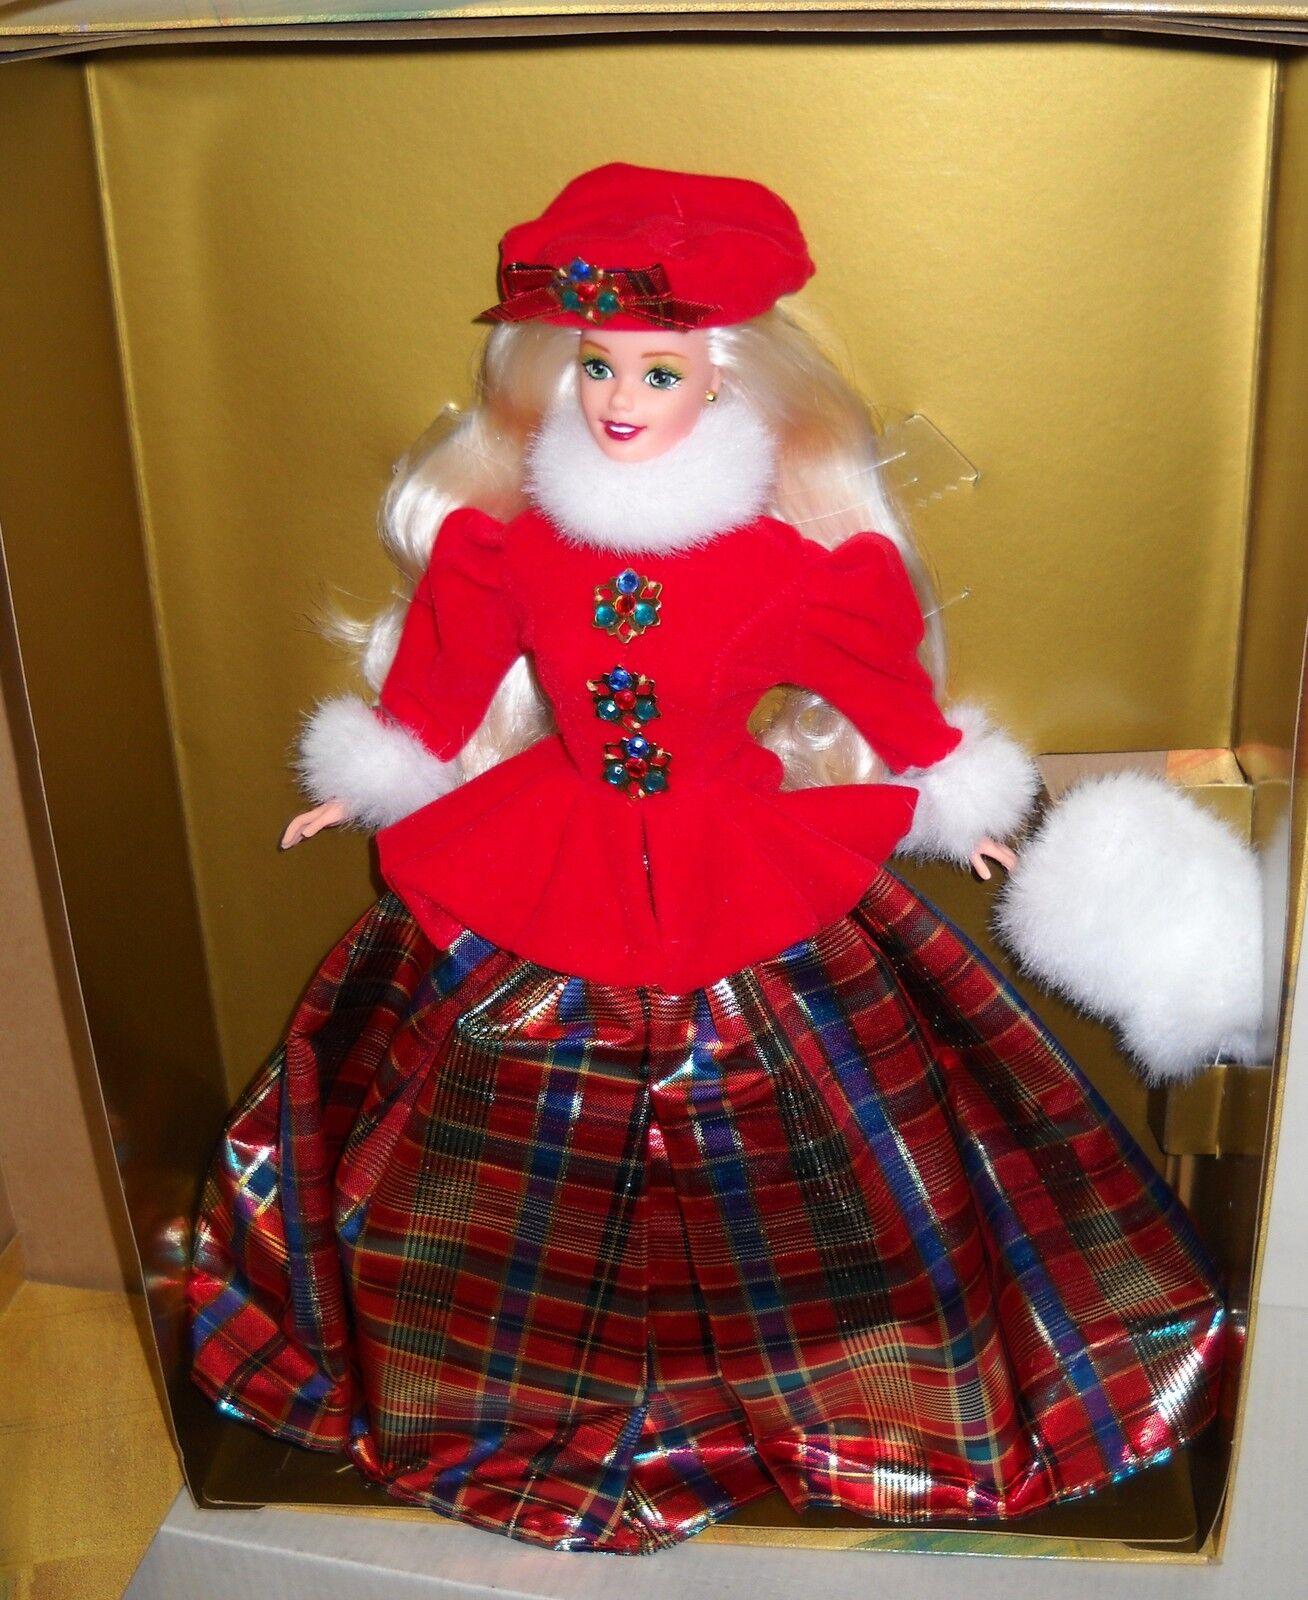 Nrfb Mattel Winter Princess Collection Jewel Princess Barbie cuarto en Series